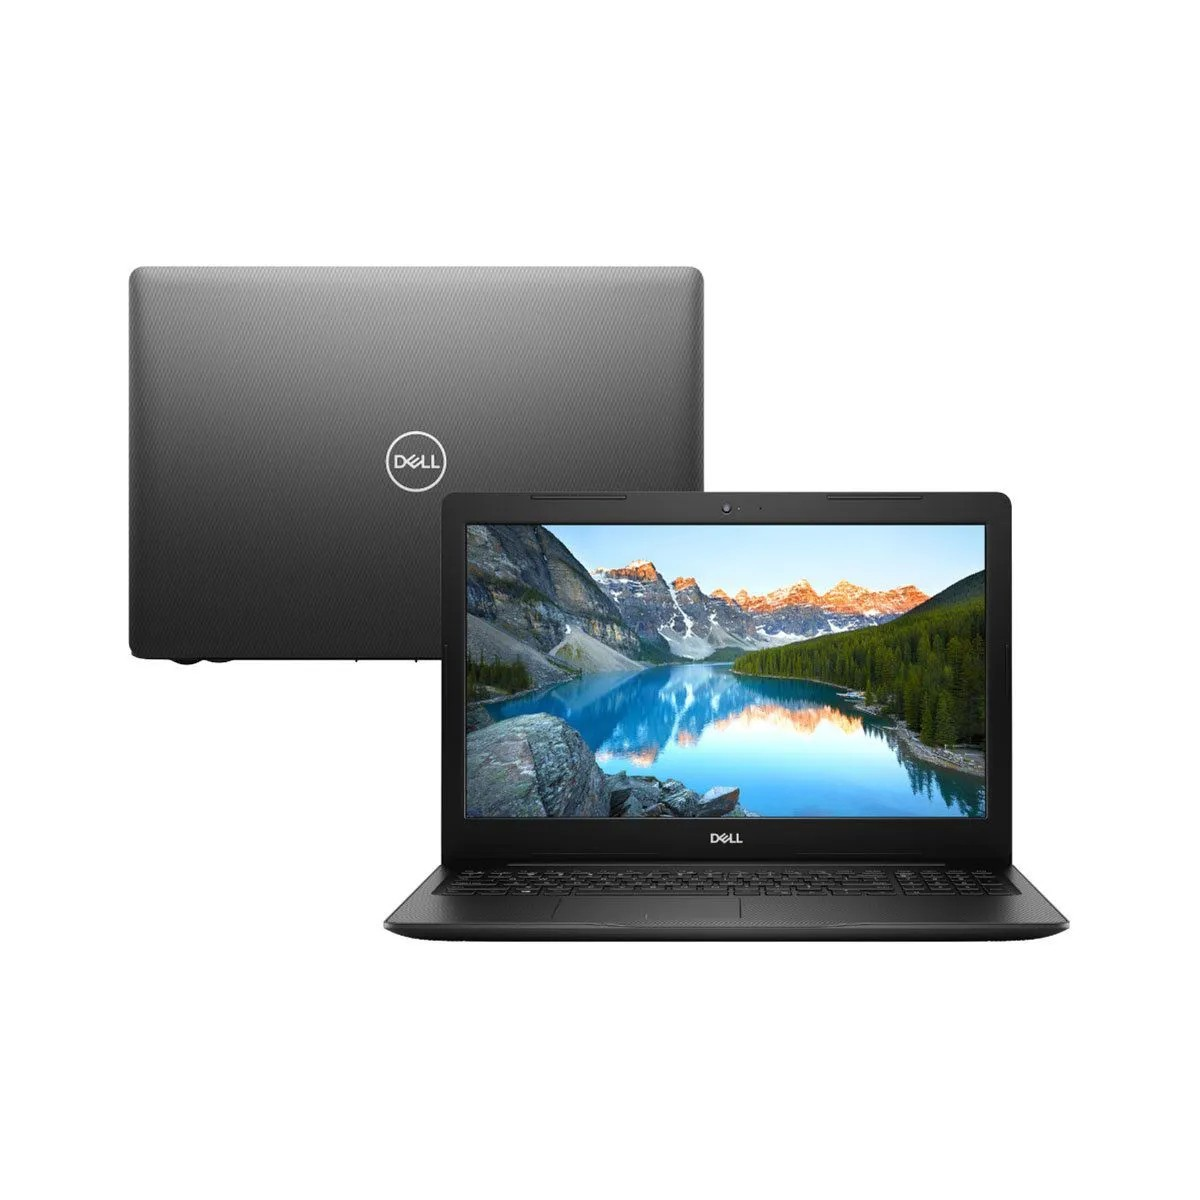 Notebook Dell Inspiron 3583 Core I7 8565U Memoria 8Gb Hd 2Tb Tela 15.6' Fhd Sistema Windows 10 Home